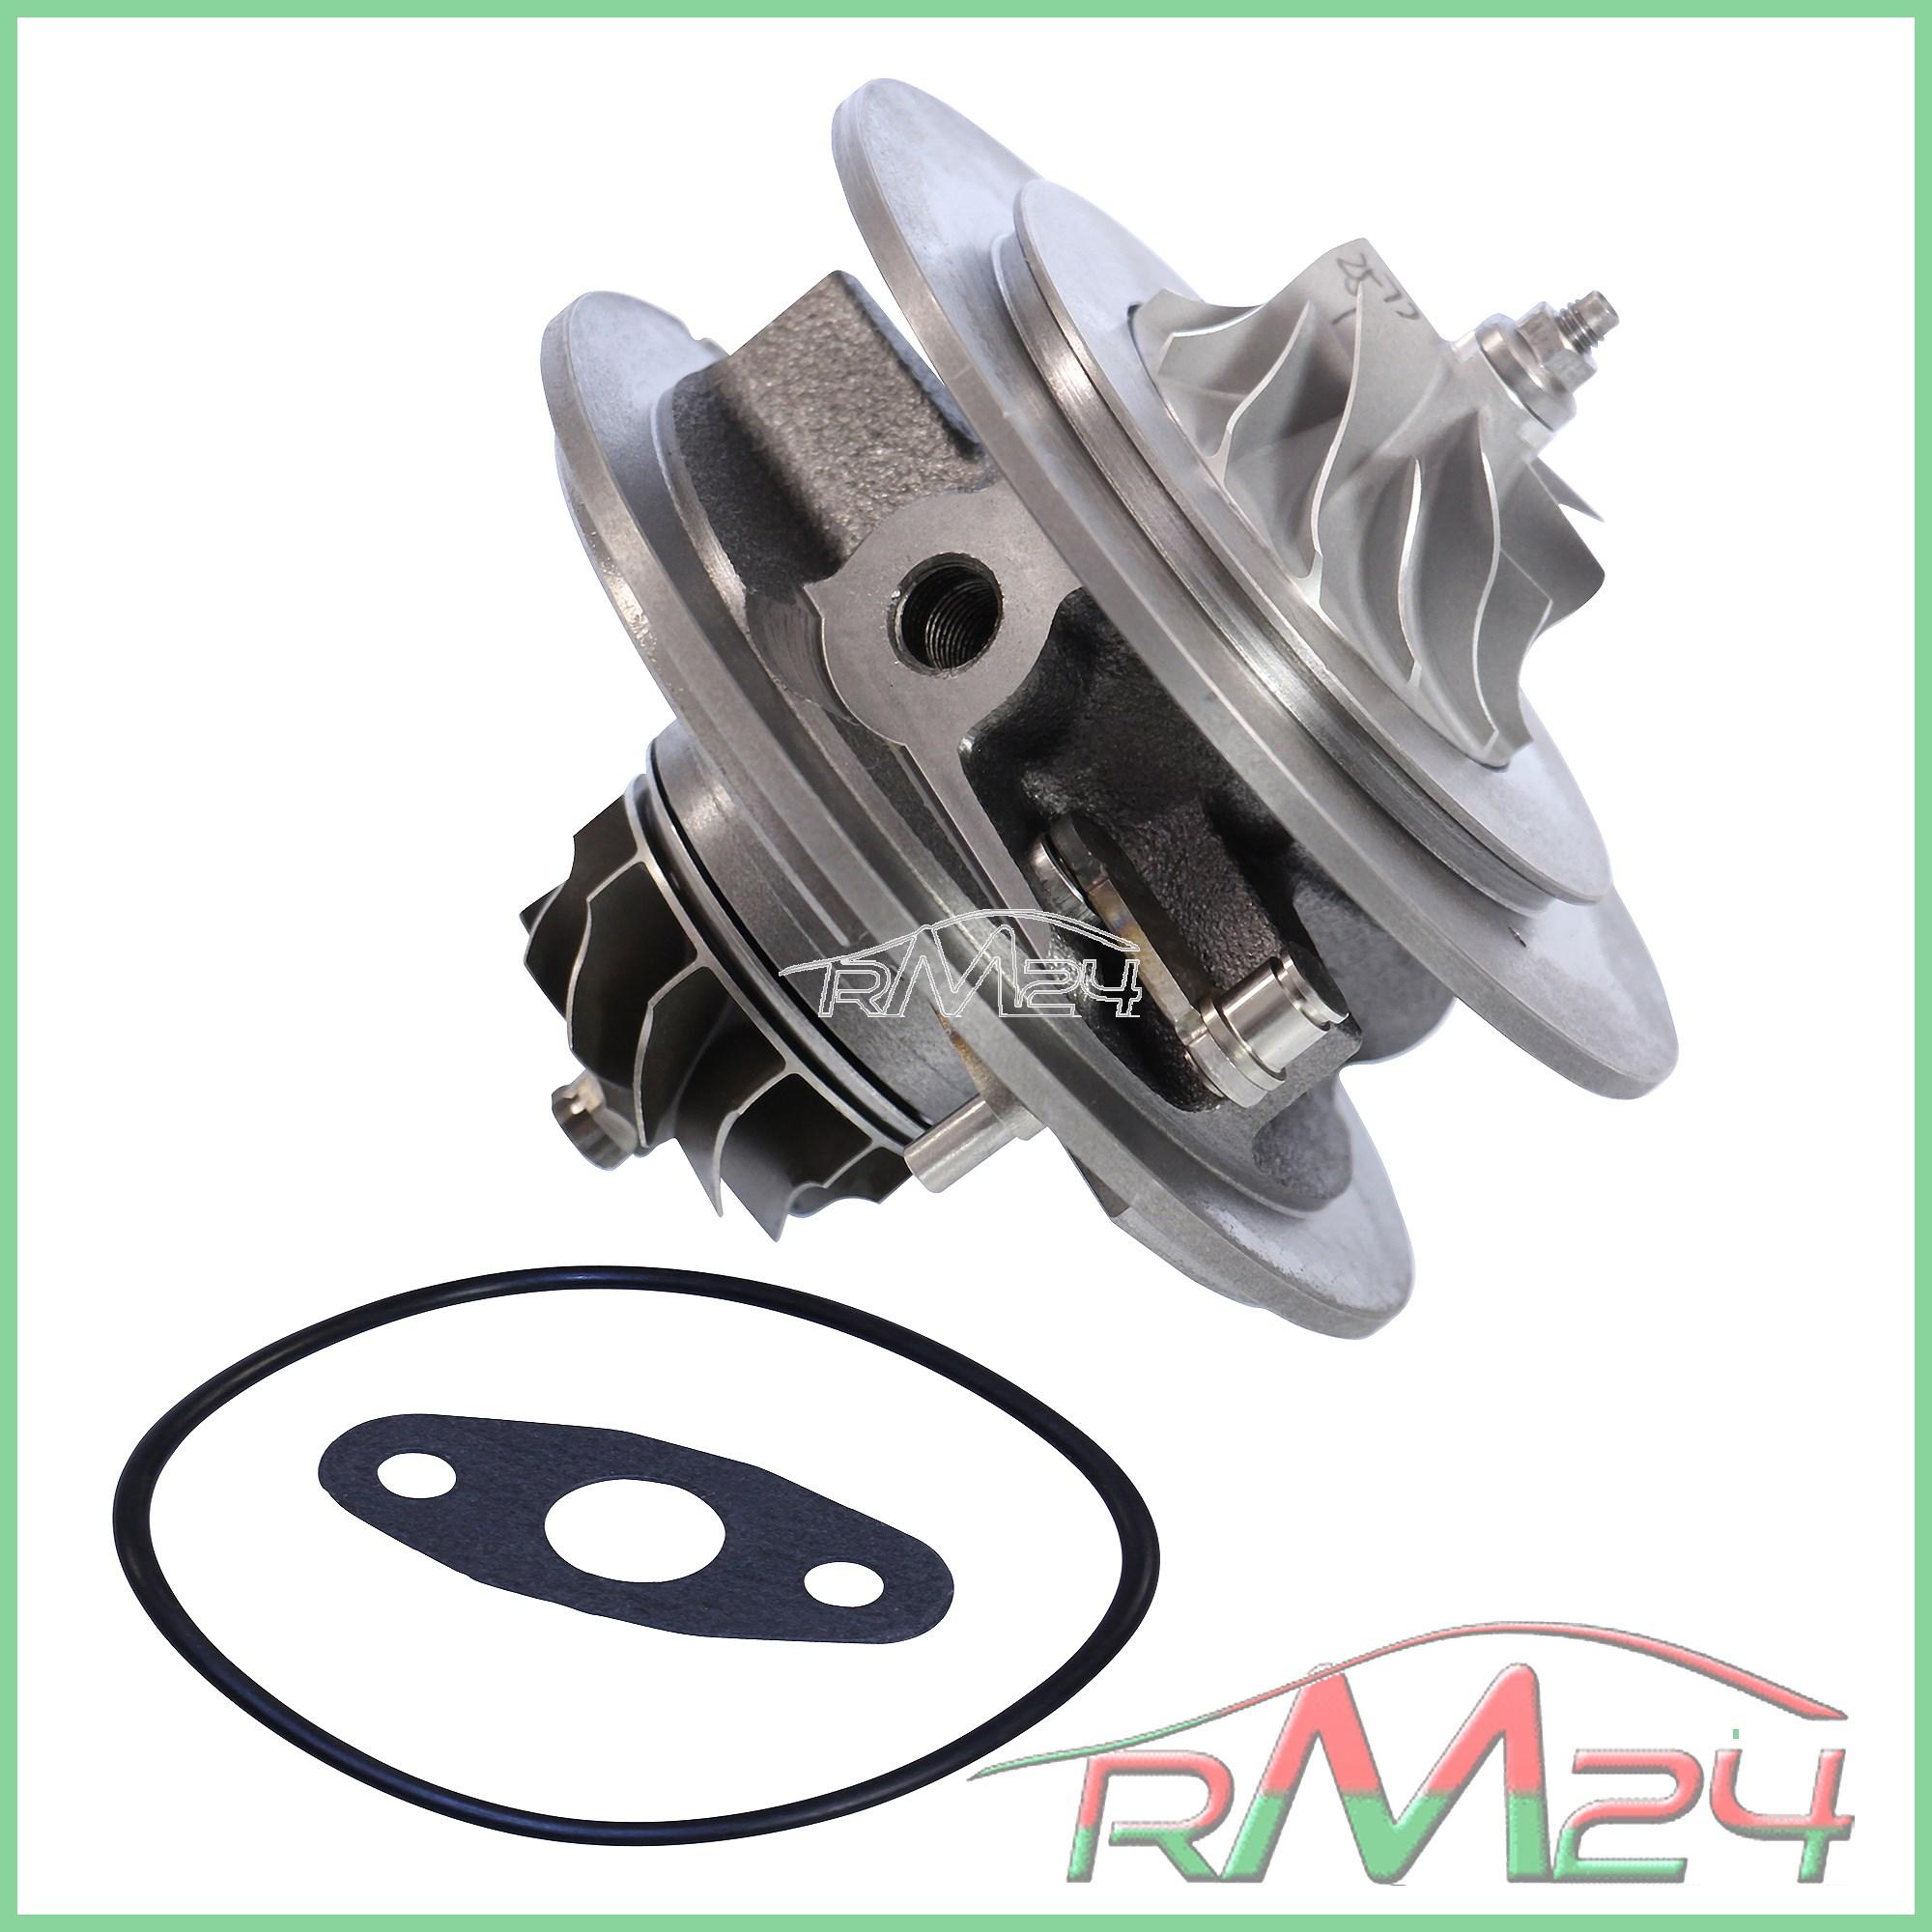 1X-CORE-ASSY-TURBOCOMPRESSORE-GAS-BMW-SERIE-1-I-E81-E87